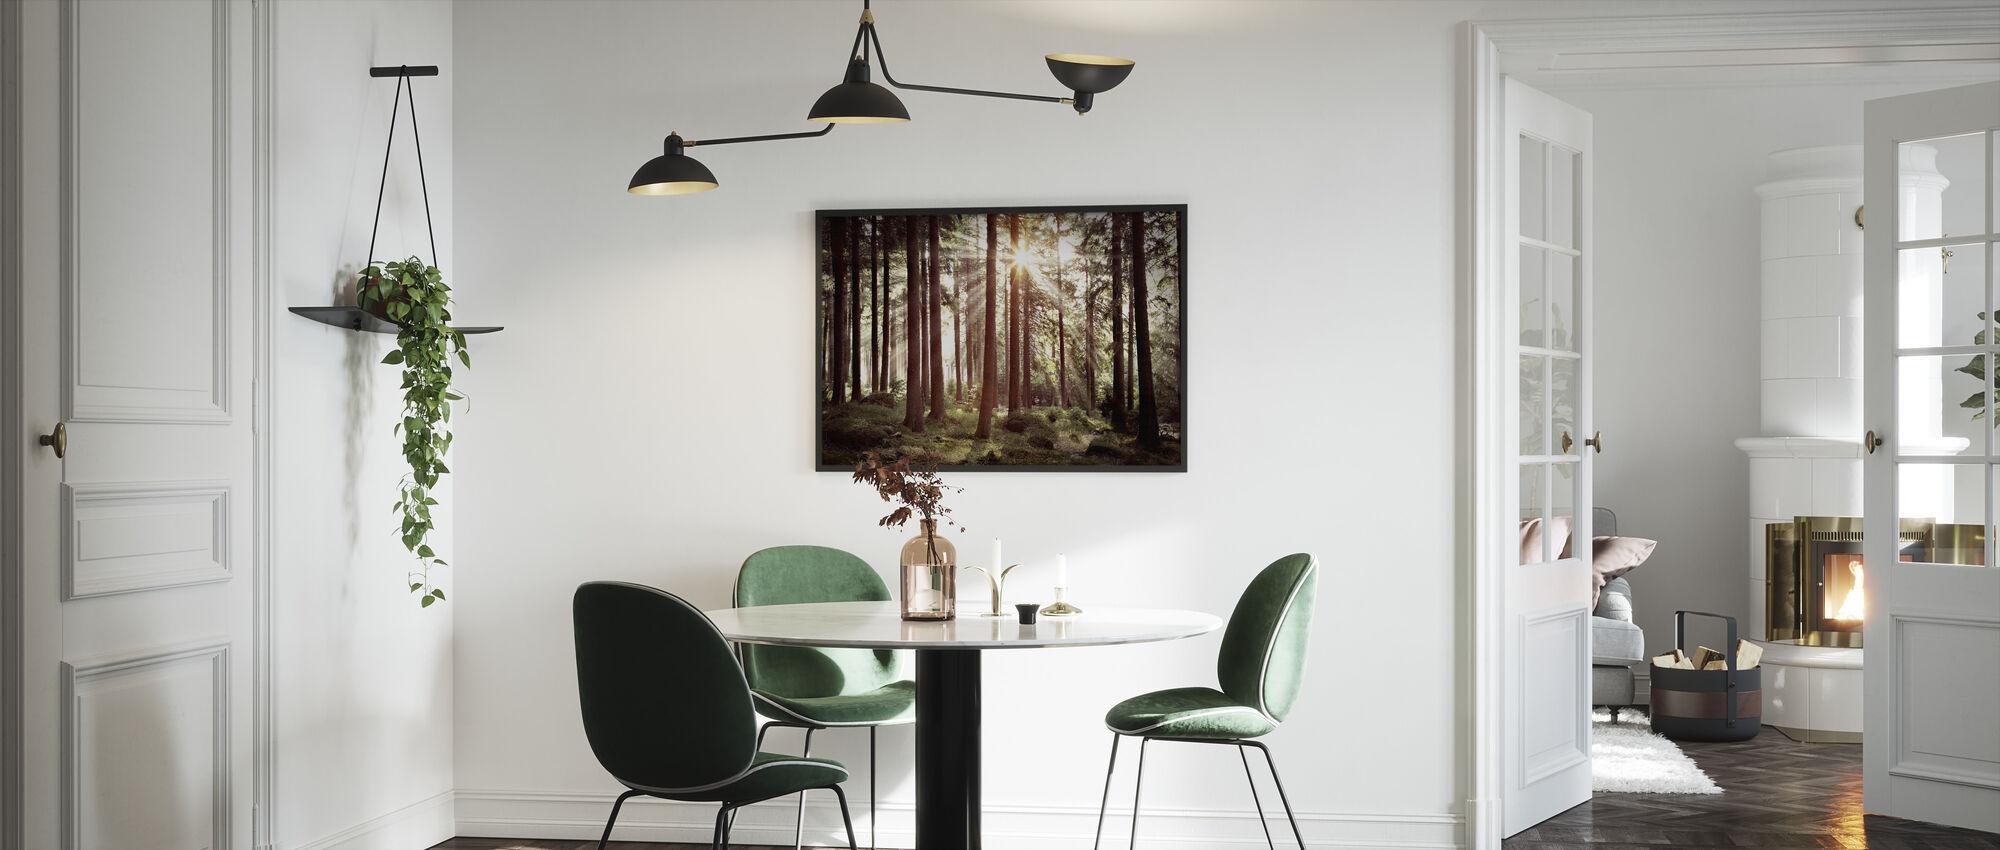 Solstråle genom träd - Retro - Inramad tavla - Kök